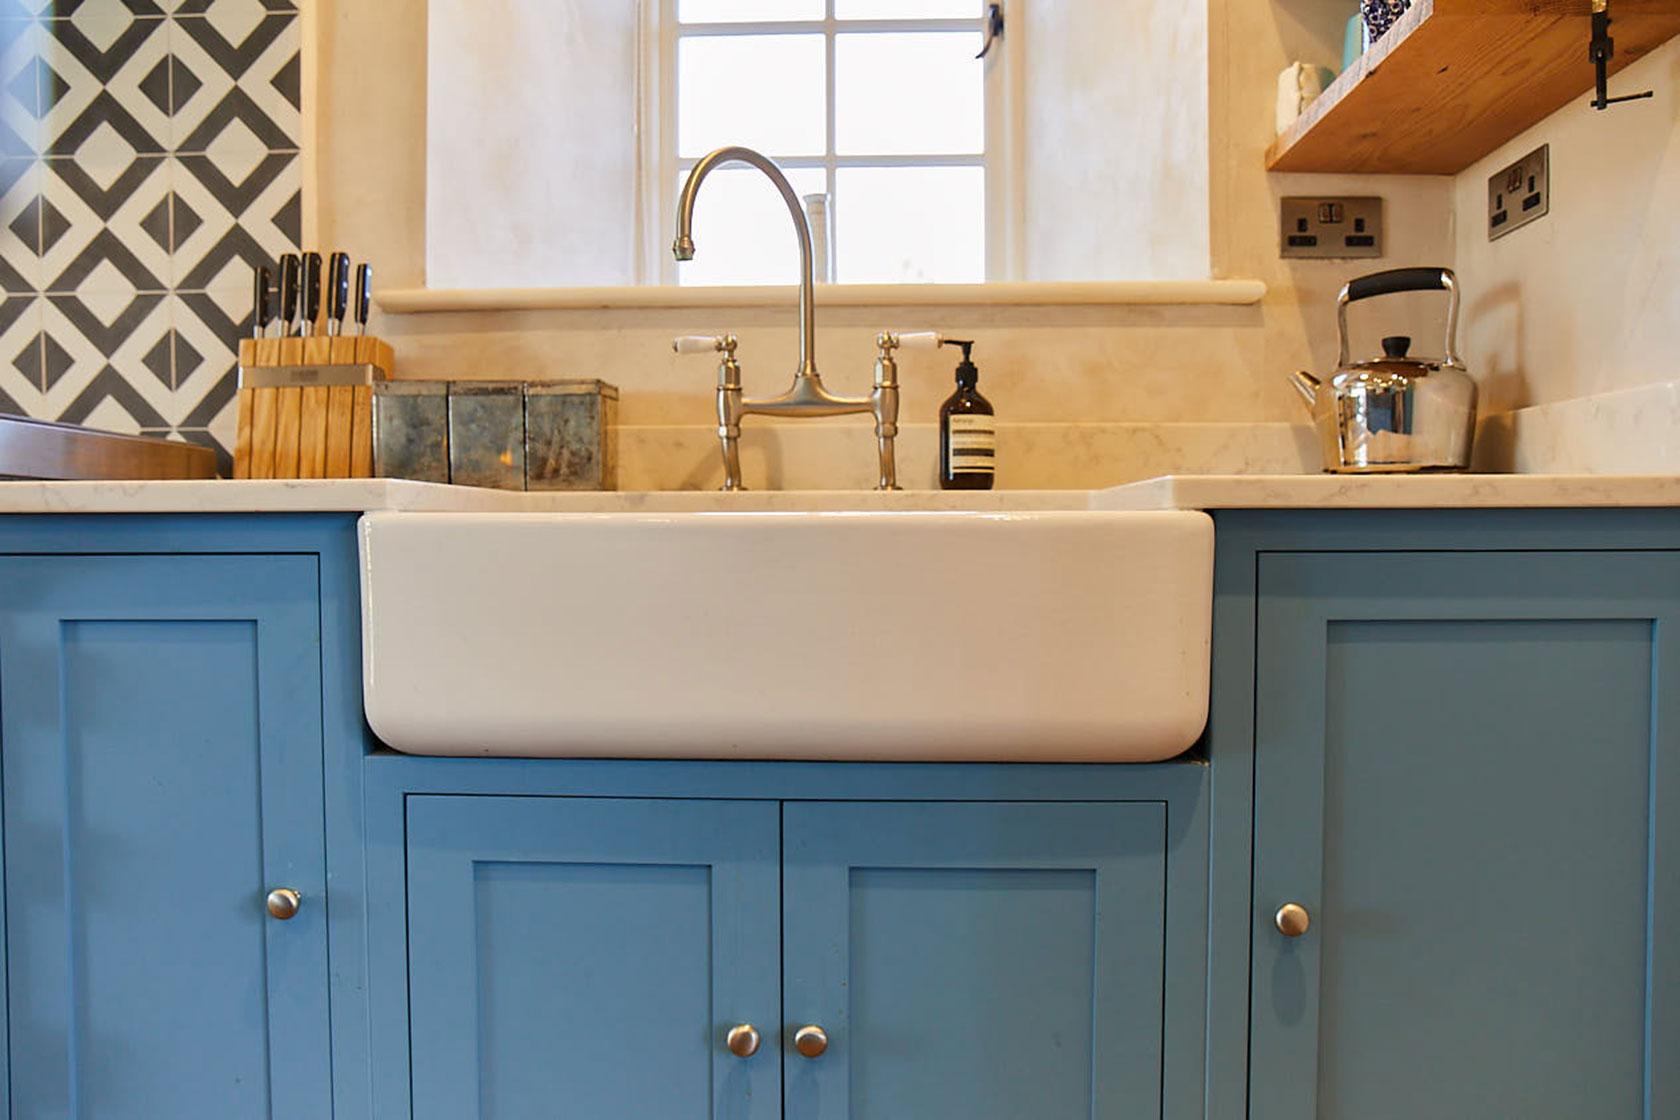 Double Belfast ceramic sink on light blue bespoke kitchen units